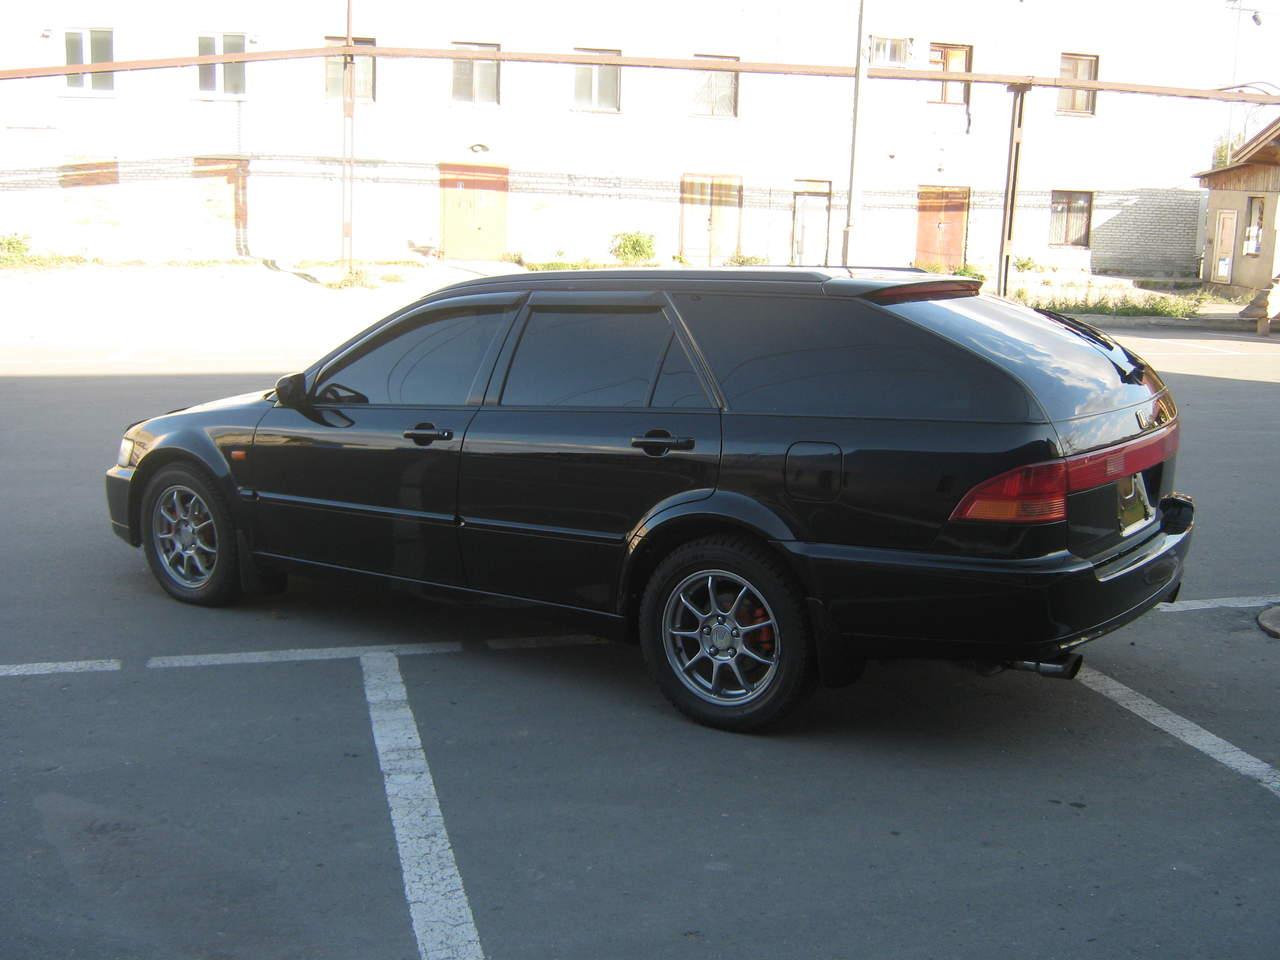 1999 honda accord wagon pictures gasoline ff